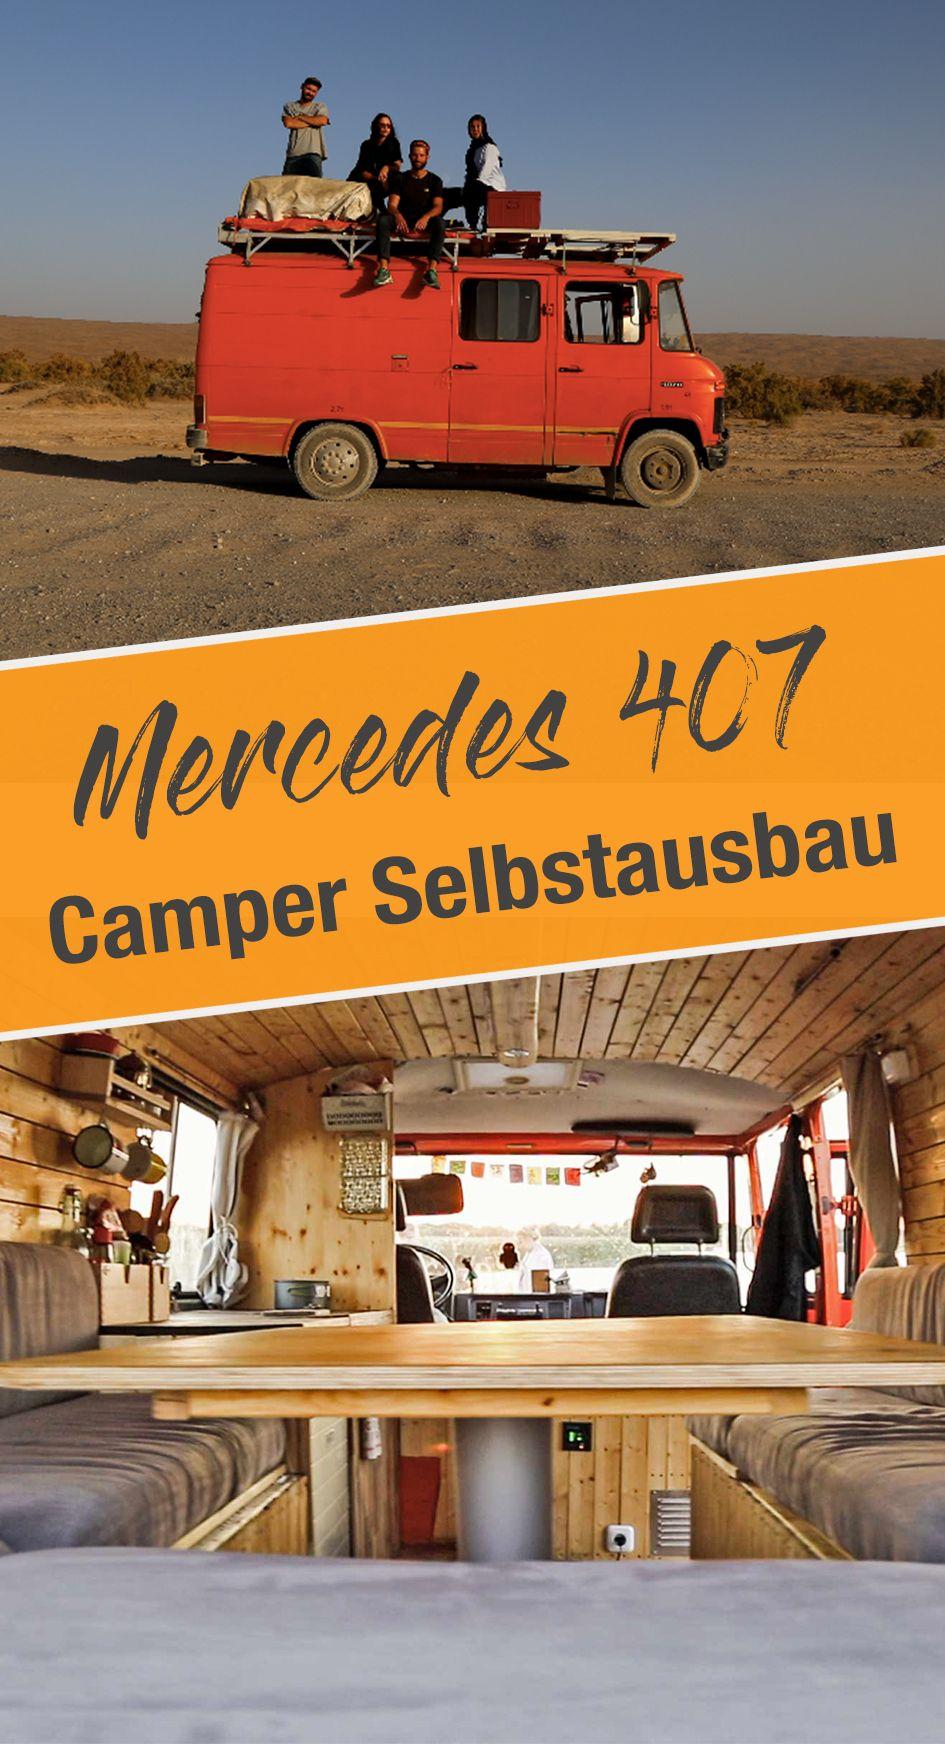 mercedes 407d wohnmobil selbstausbau campingbus ausbau. Black Bedroom Furniture Sets. Home Design Ideas